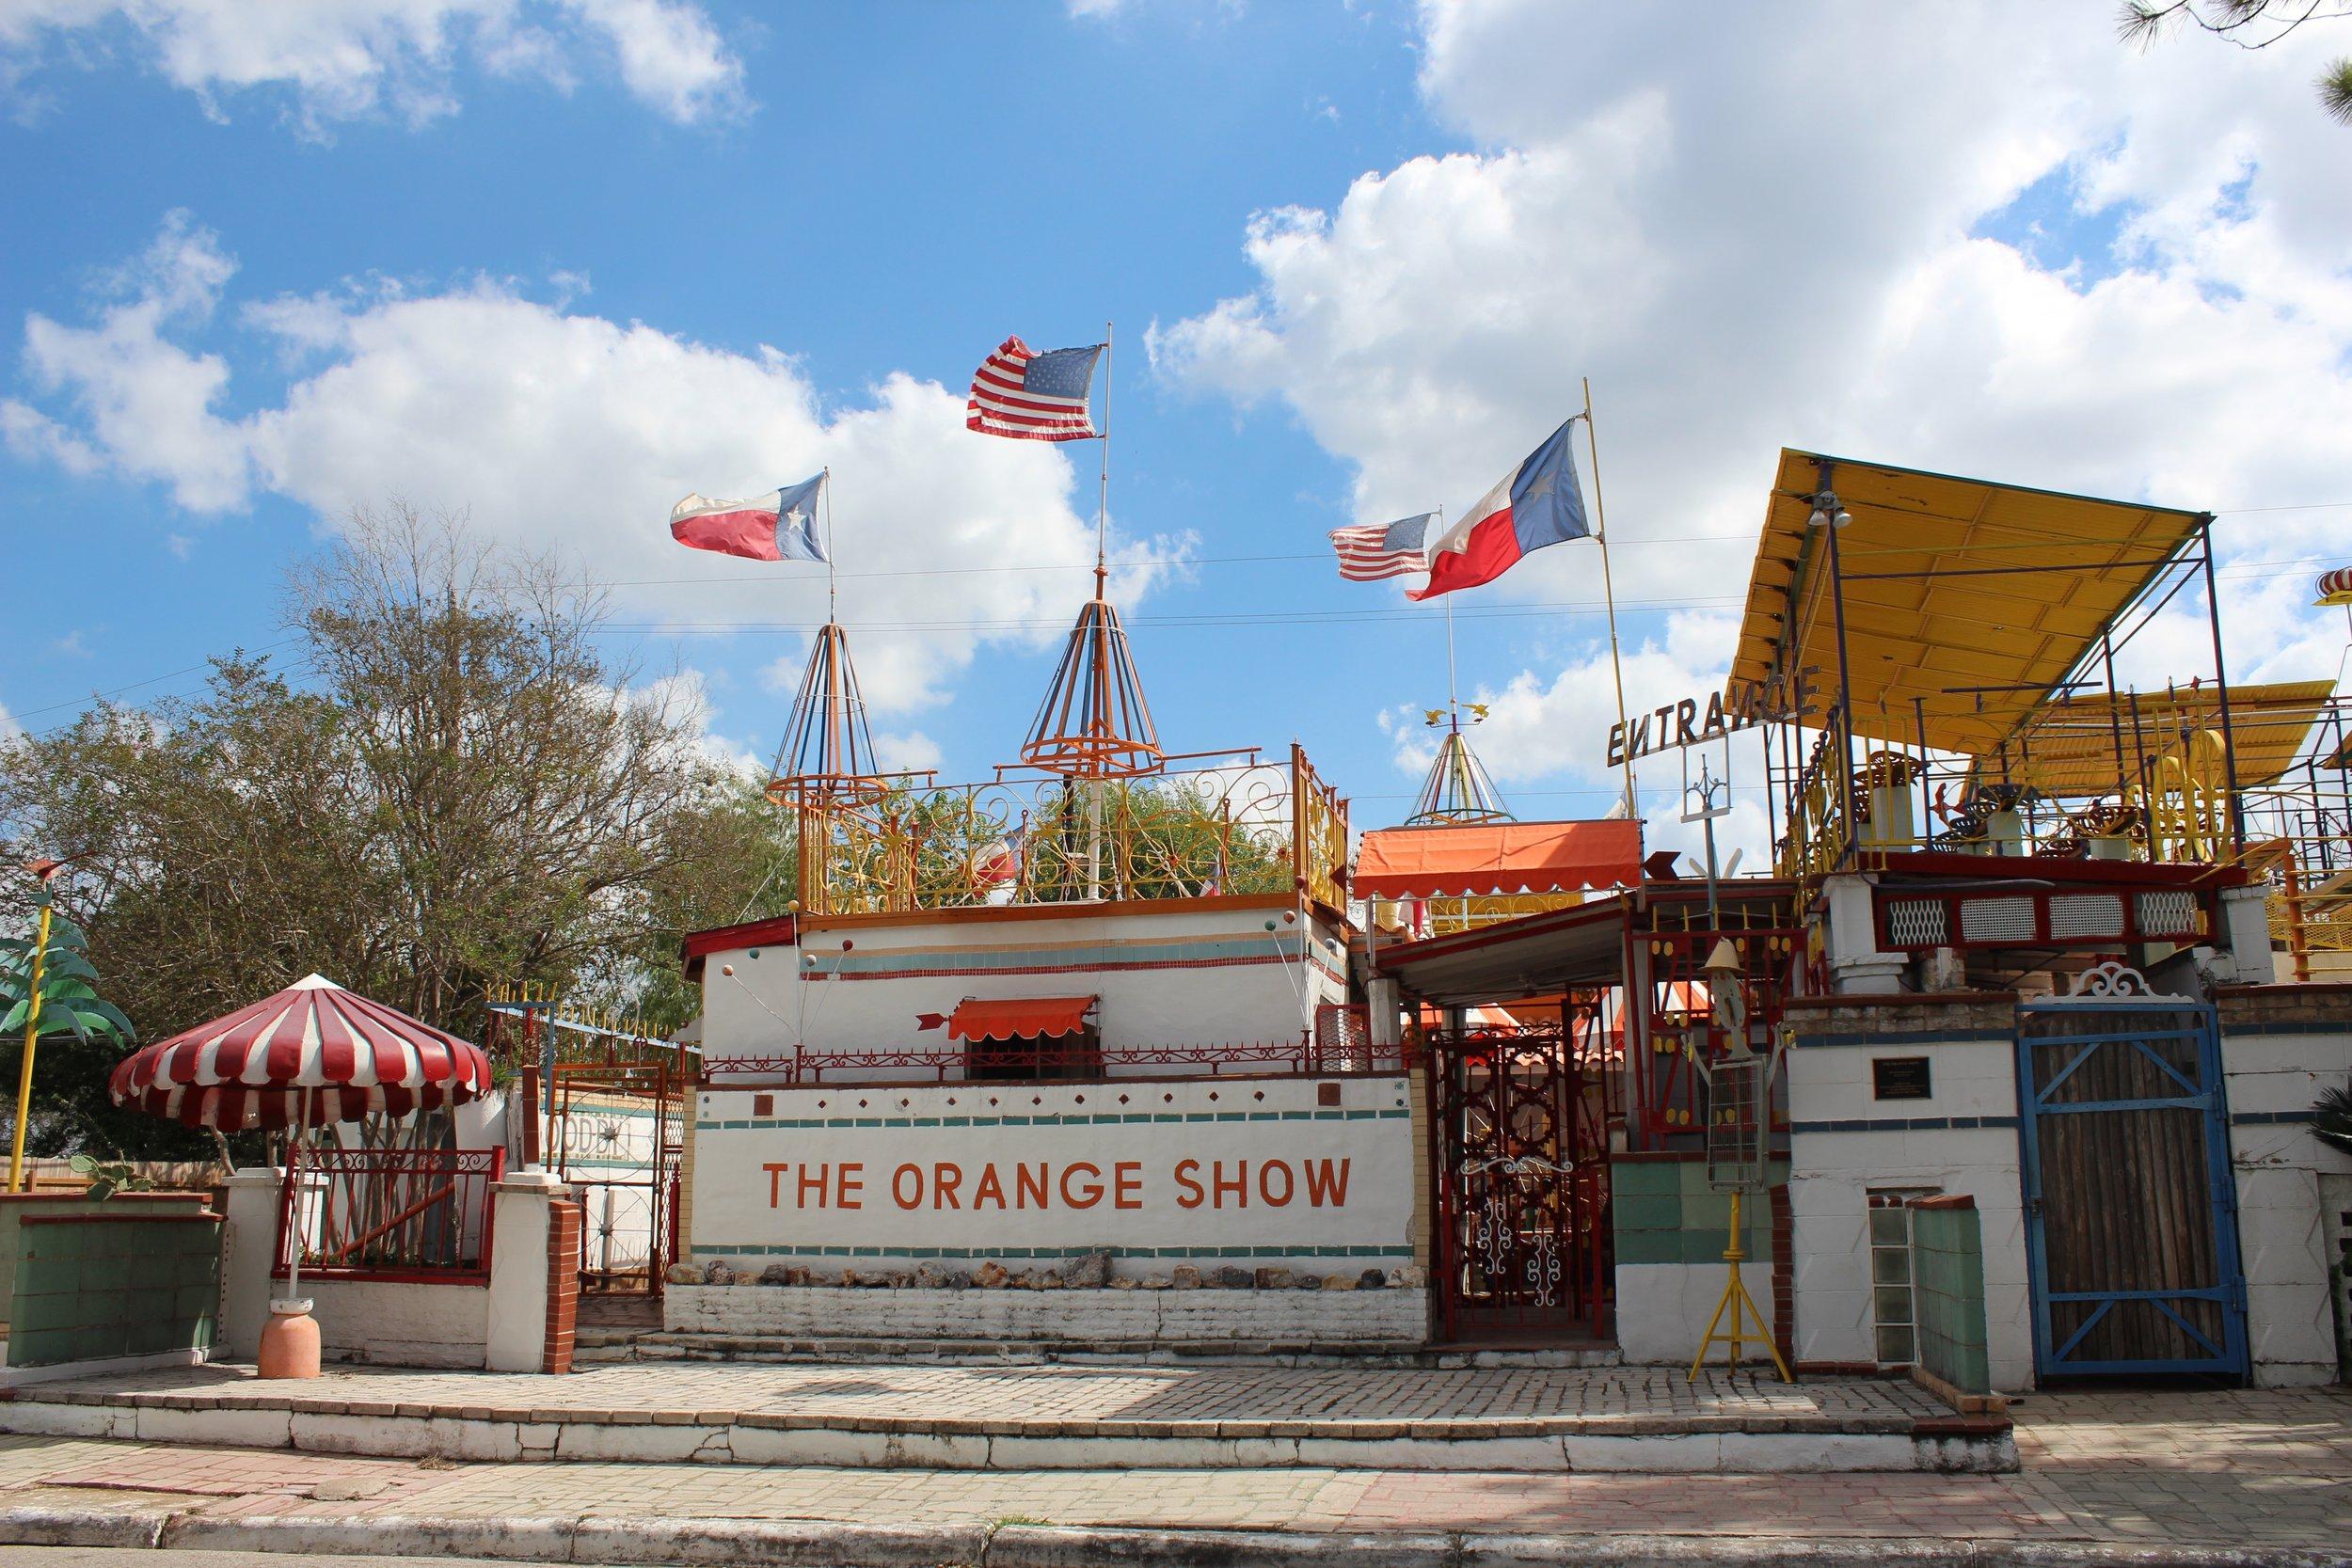 orangeshow_1.jpg